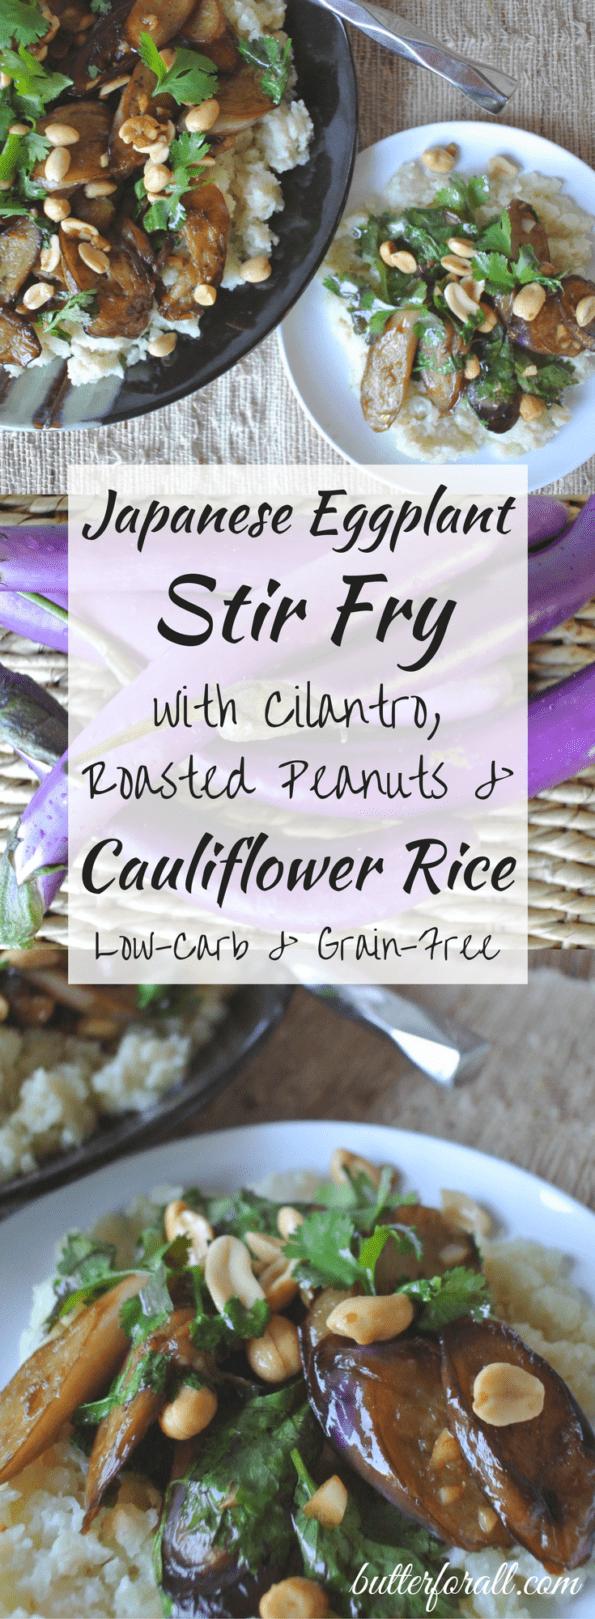 Japanese Eggplant Stir Fry With Cilantro, Roasted Peanuts And Cauliflower Rice